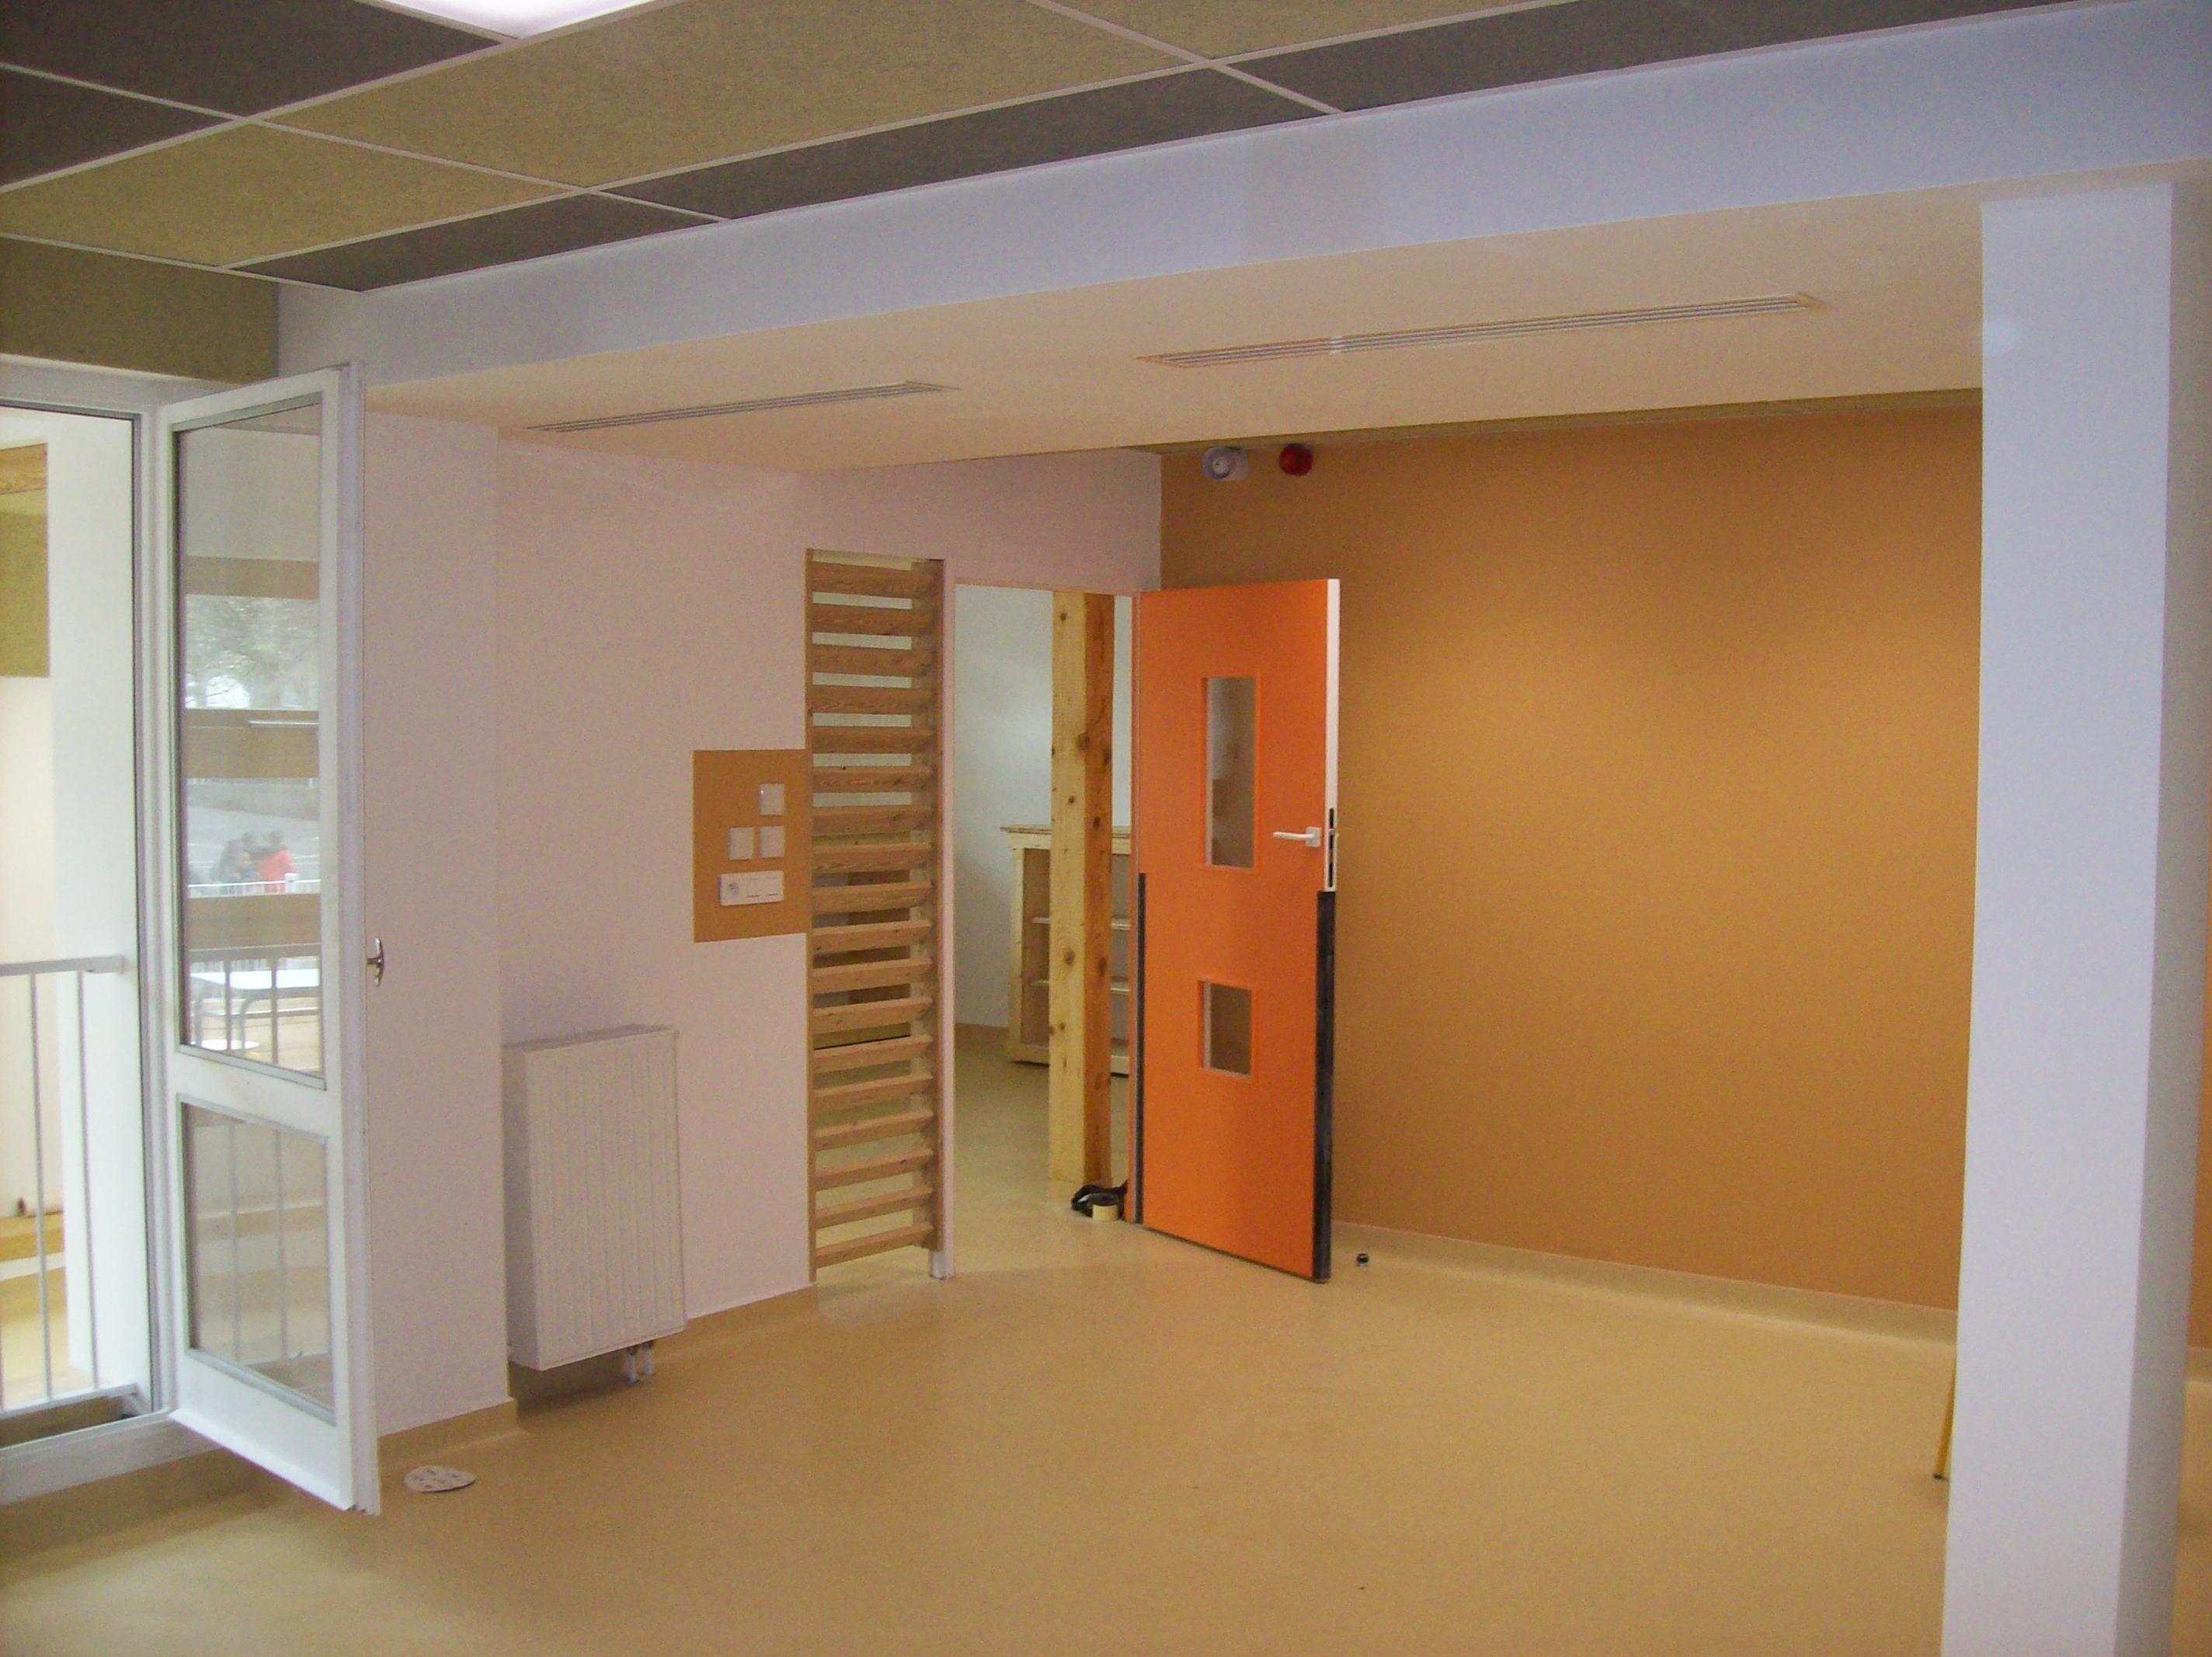 vue intérieure salle/circulation